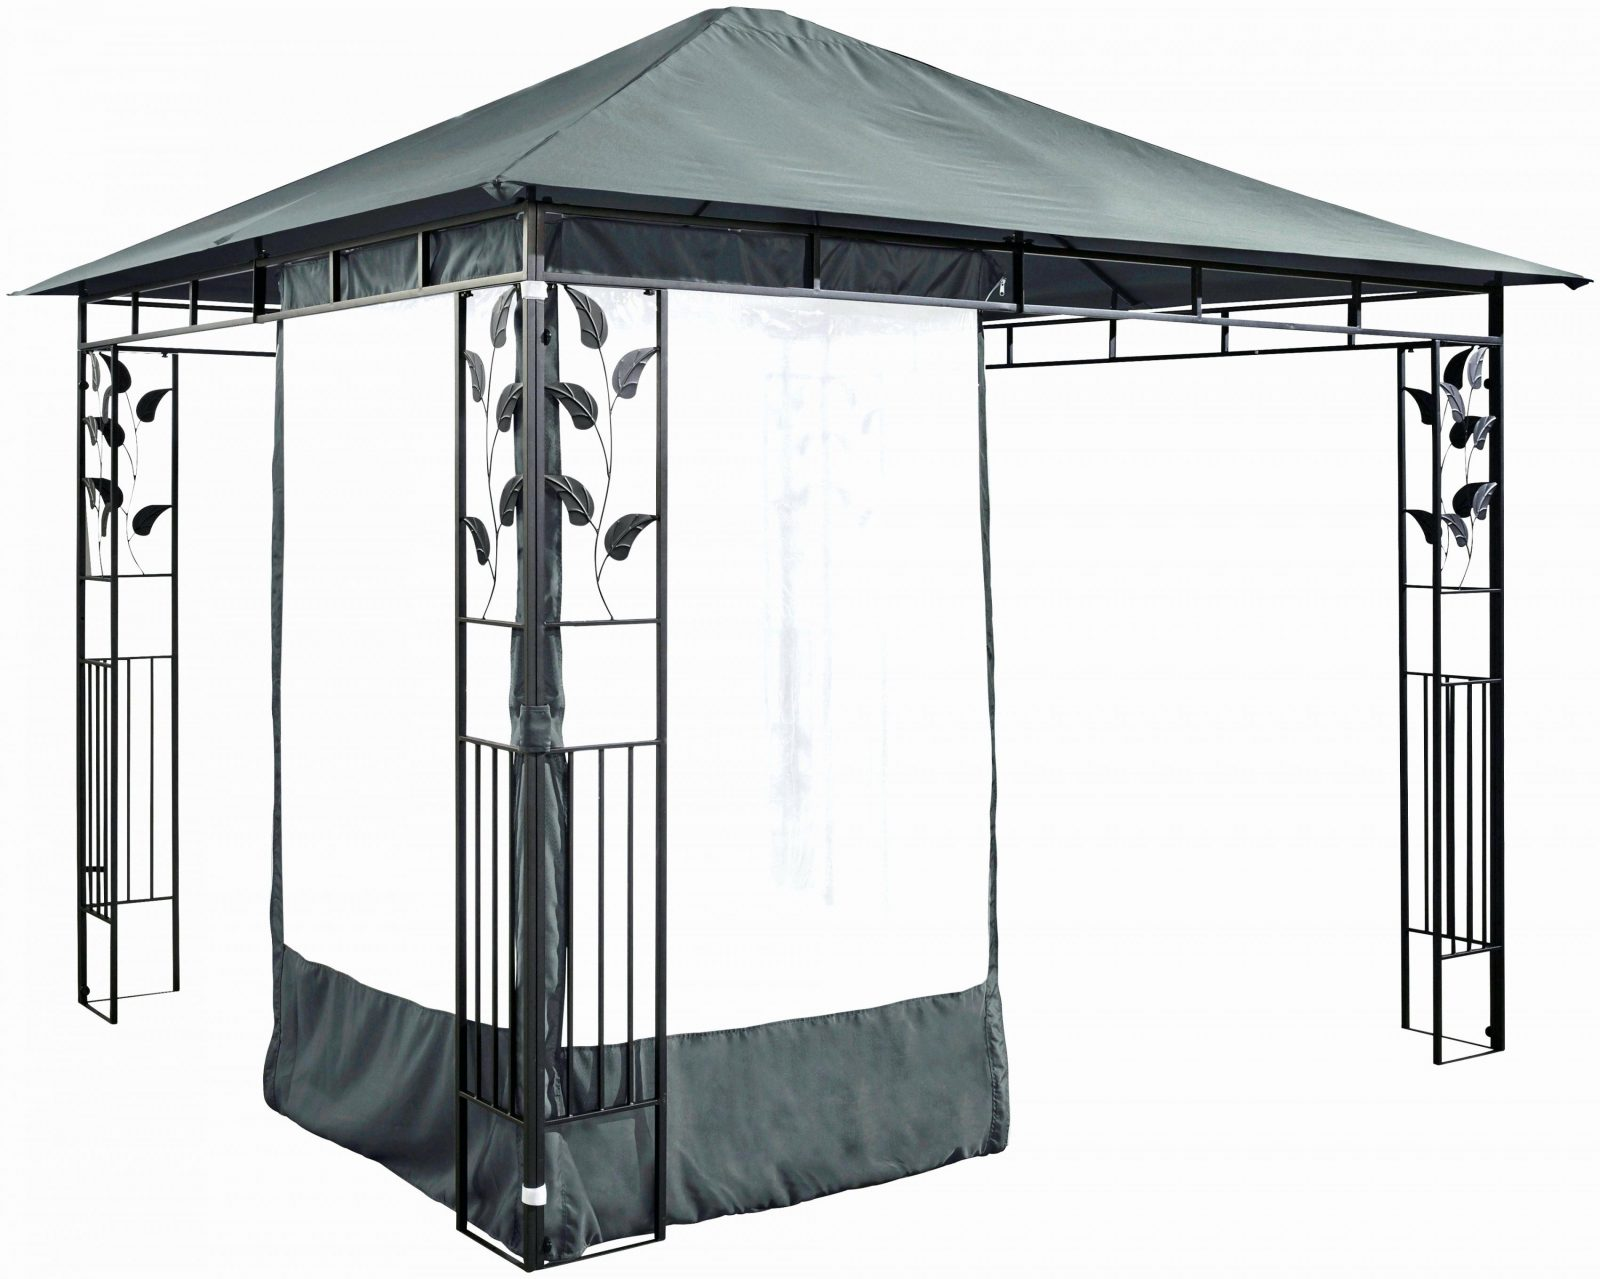 76 Inspirational Pavillon X Wasserdicht Gunstig Für Pavillon Metall von Pavillon Metall 3X3 Wasserdicht Bild